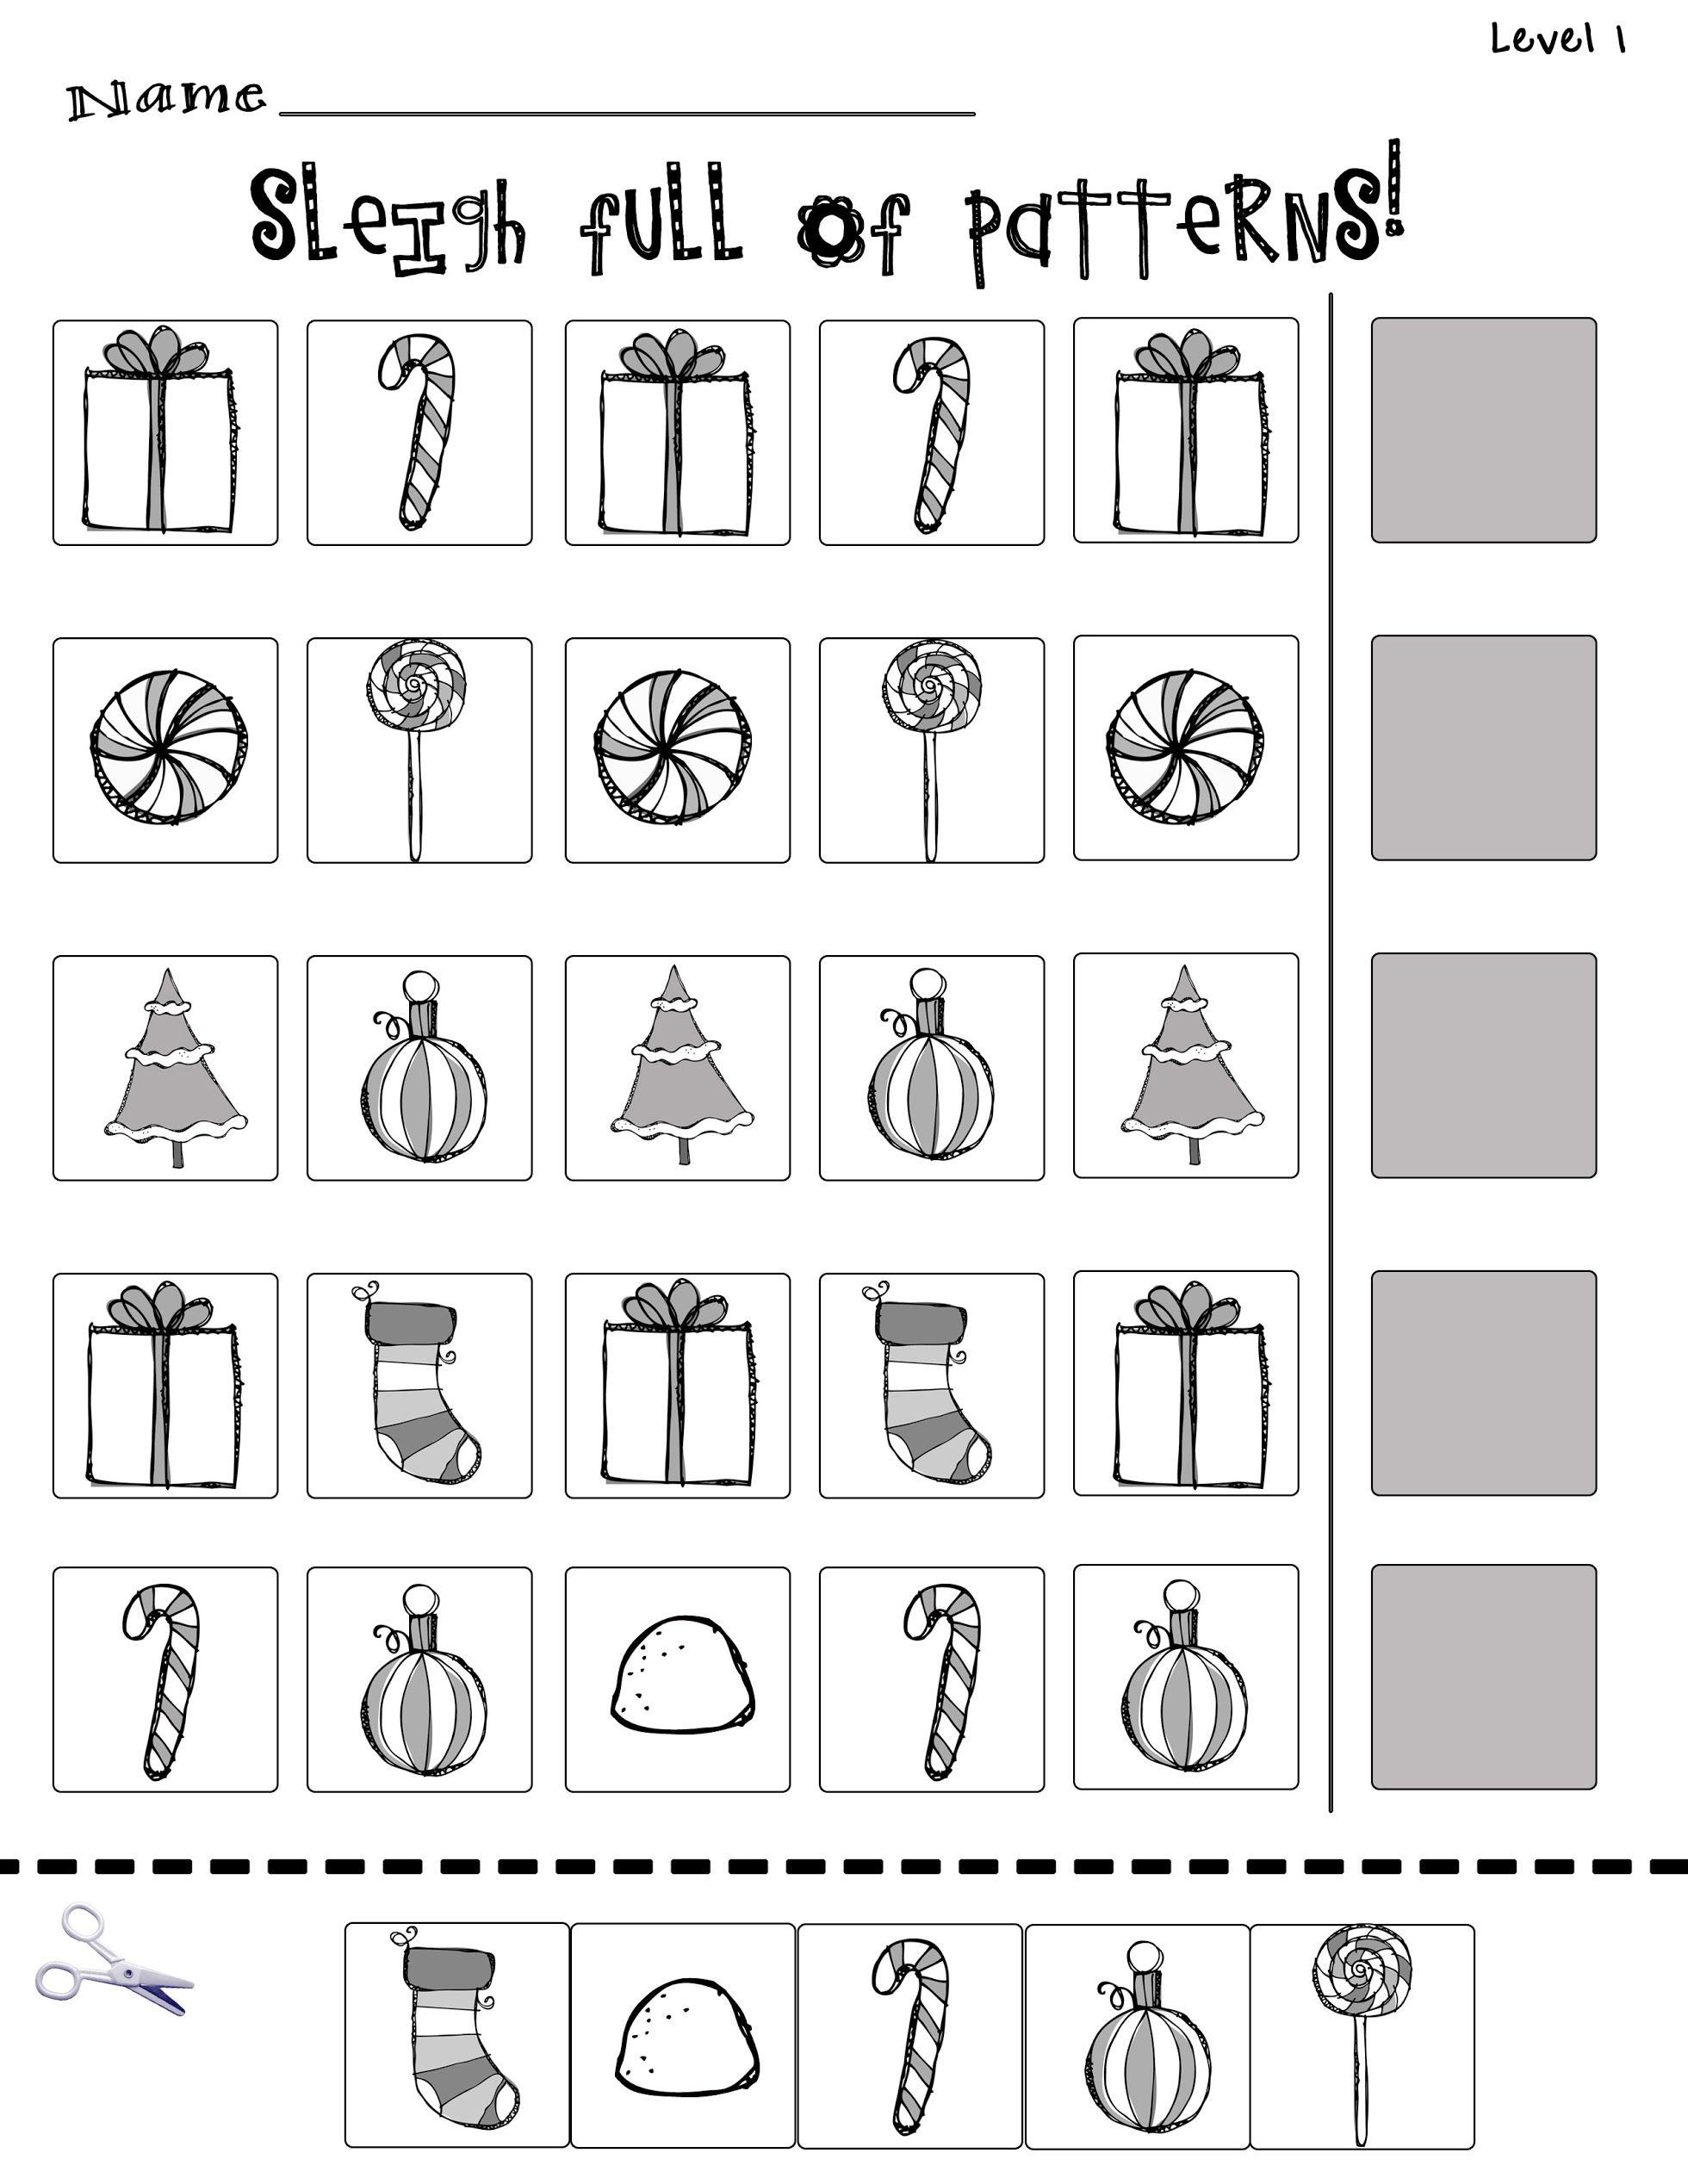 Displaying Patterns Level1 1 Copy